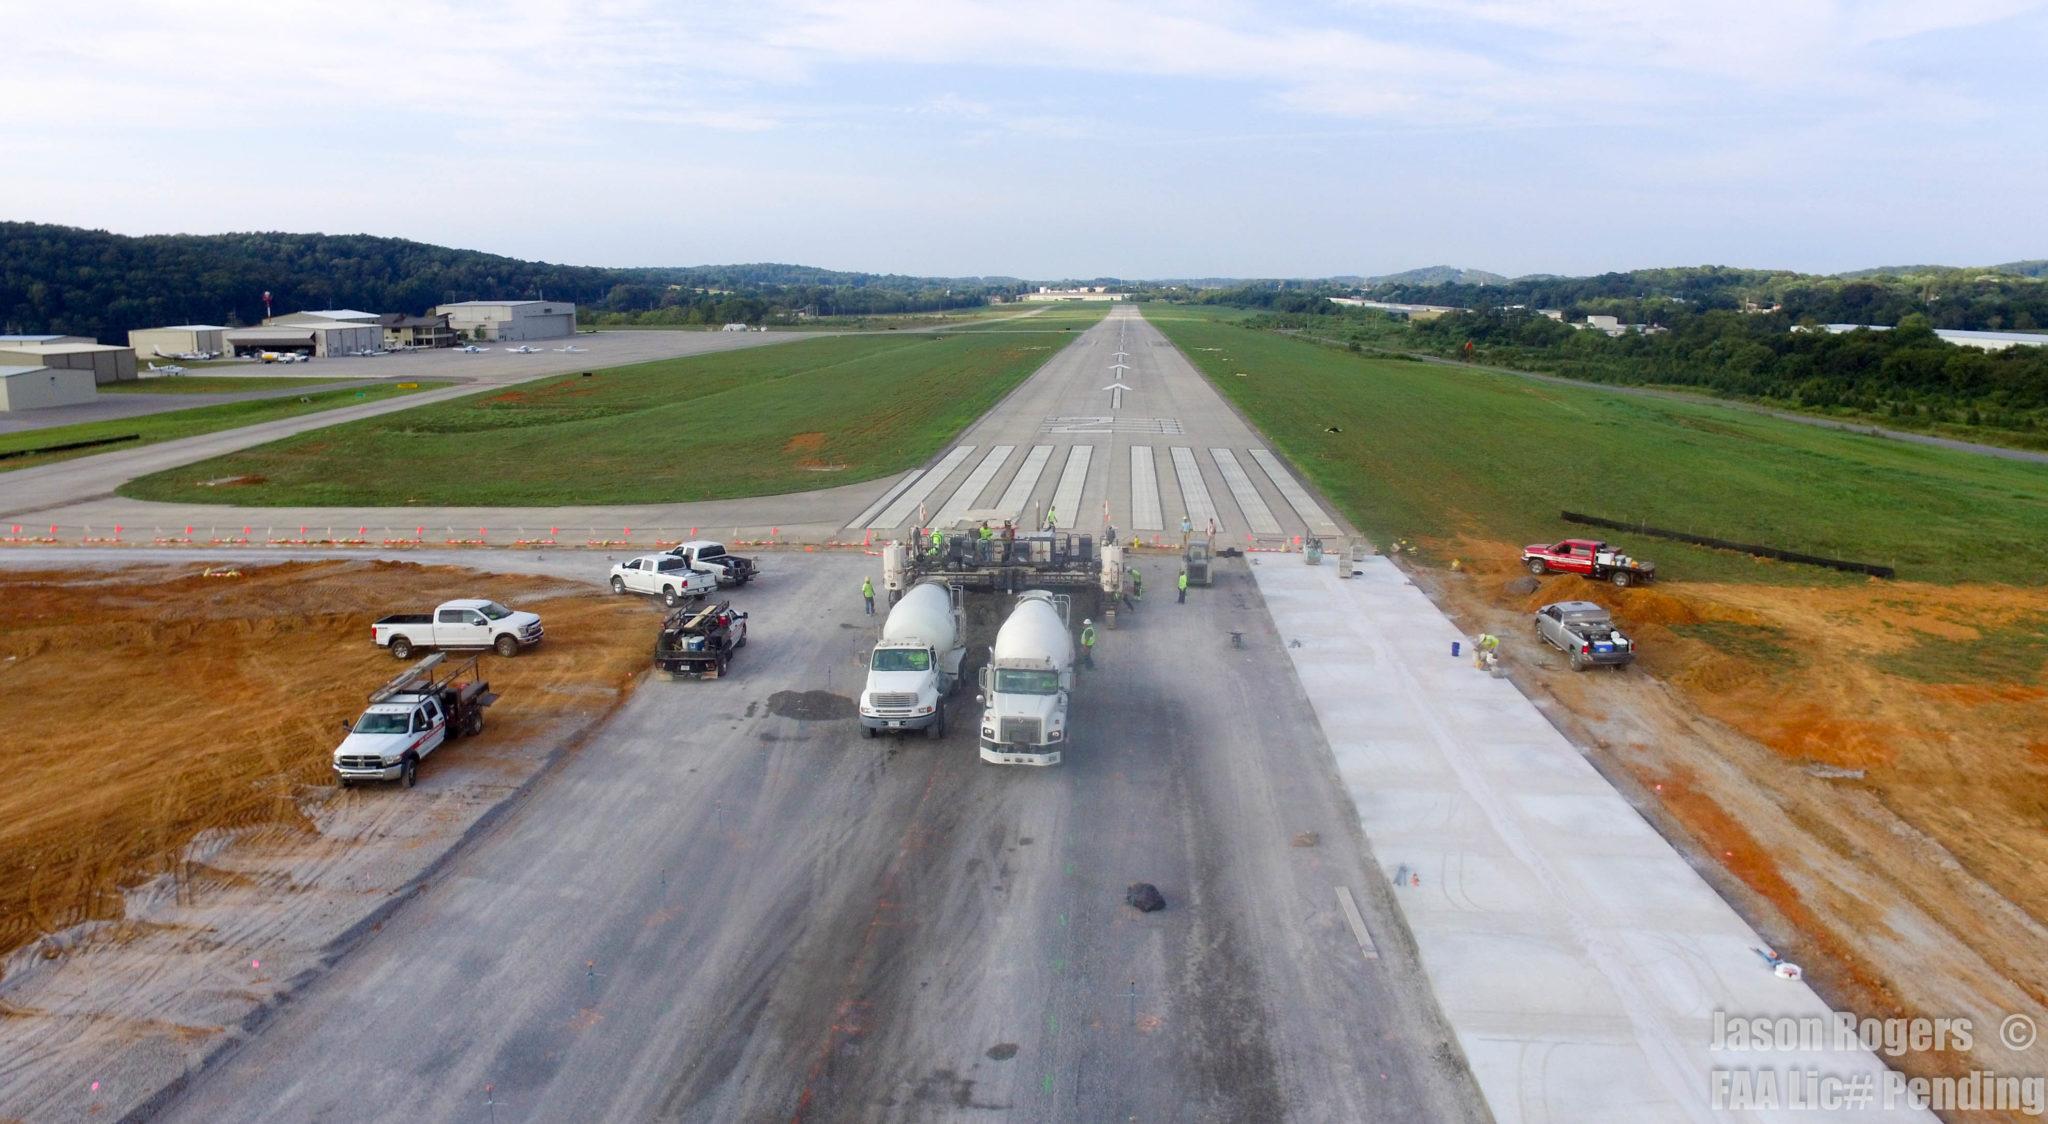 Cleveland Regional Jetport